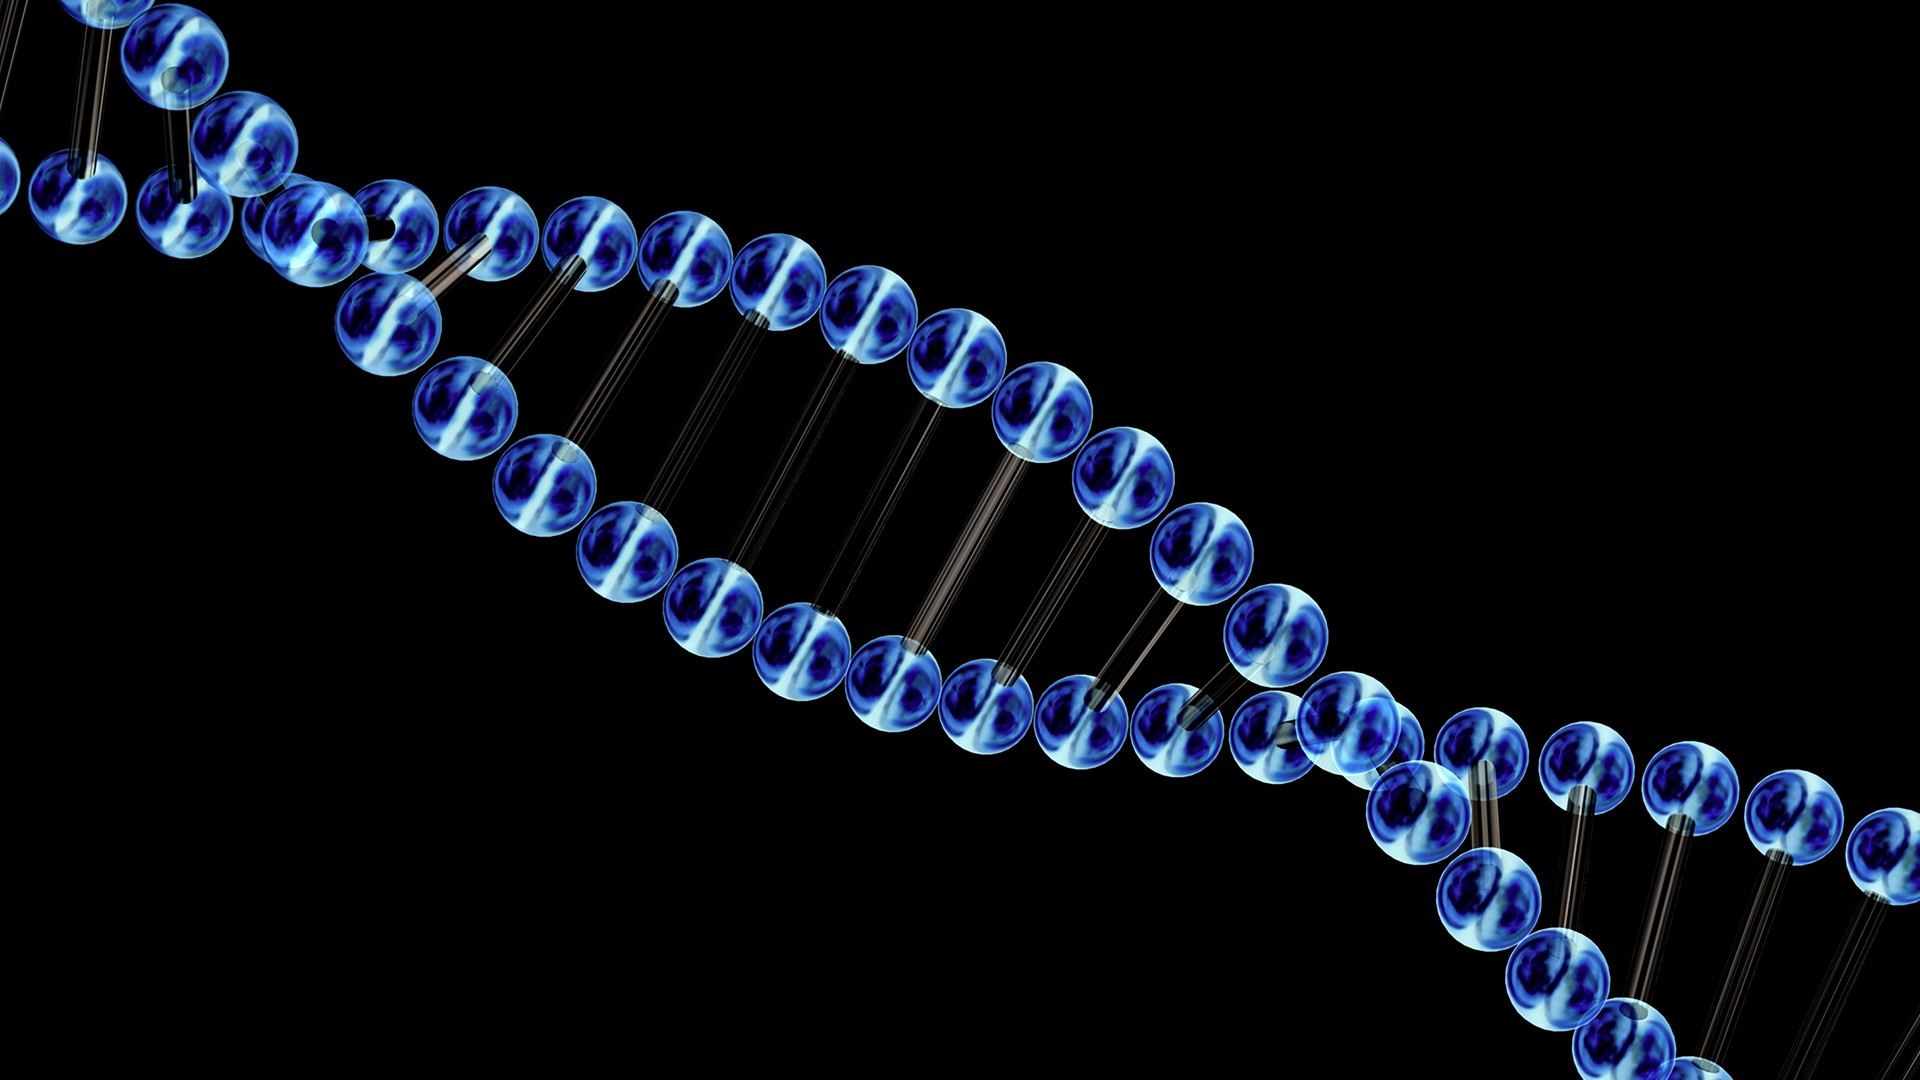 Biology Genetics Wallpaper 1920x1080 Biology Genetics DNA 1920x1080